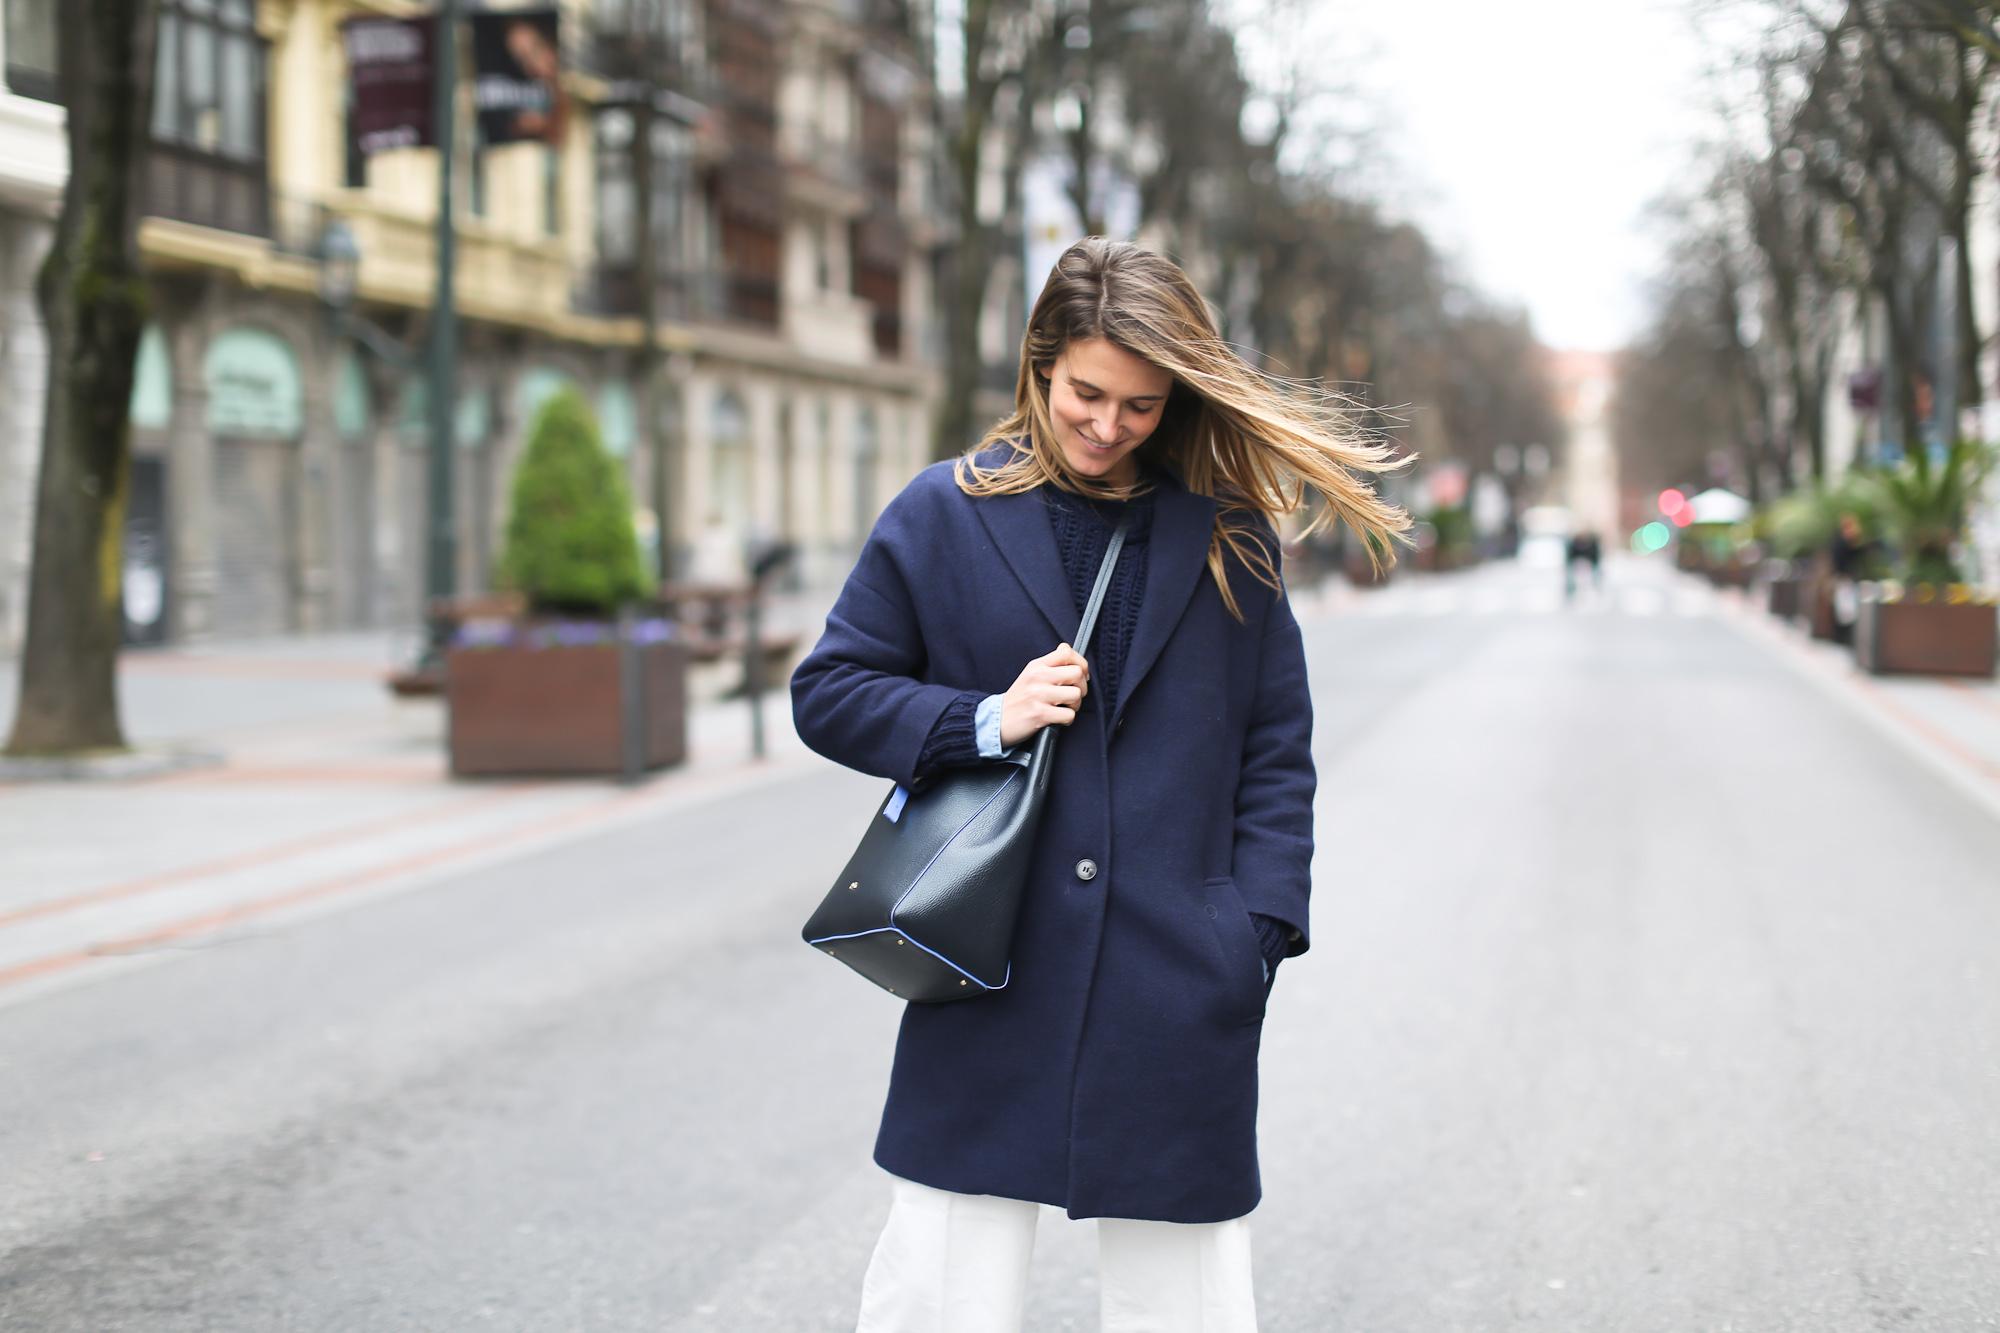 Clochet_streetstyle_masscob_coulson_coat_trimmerbilbao_granny_shoes_white_culottes-5